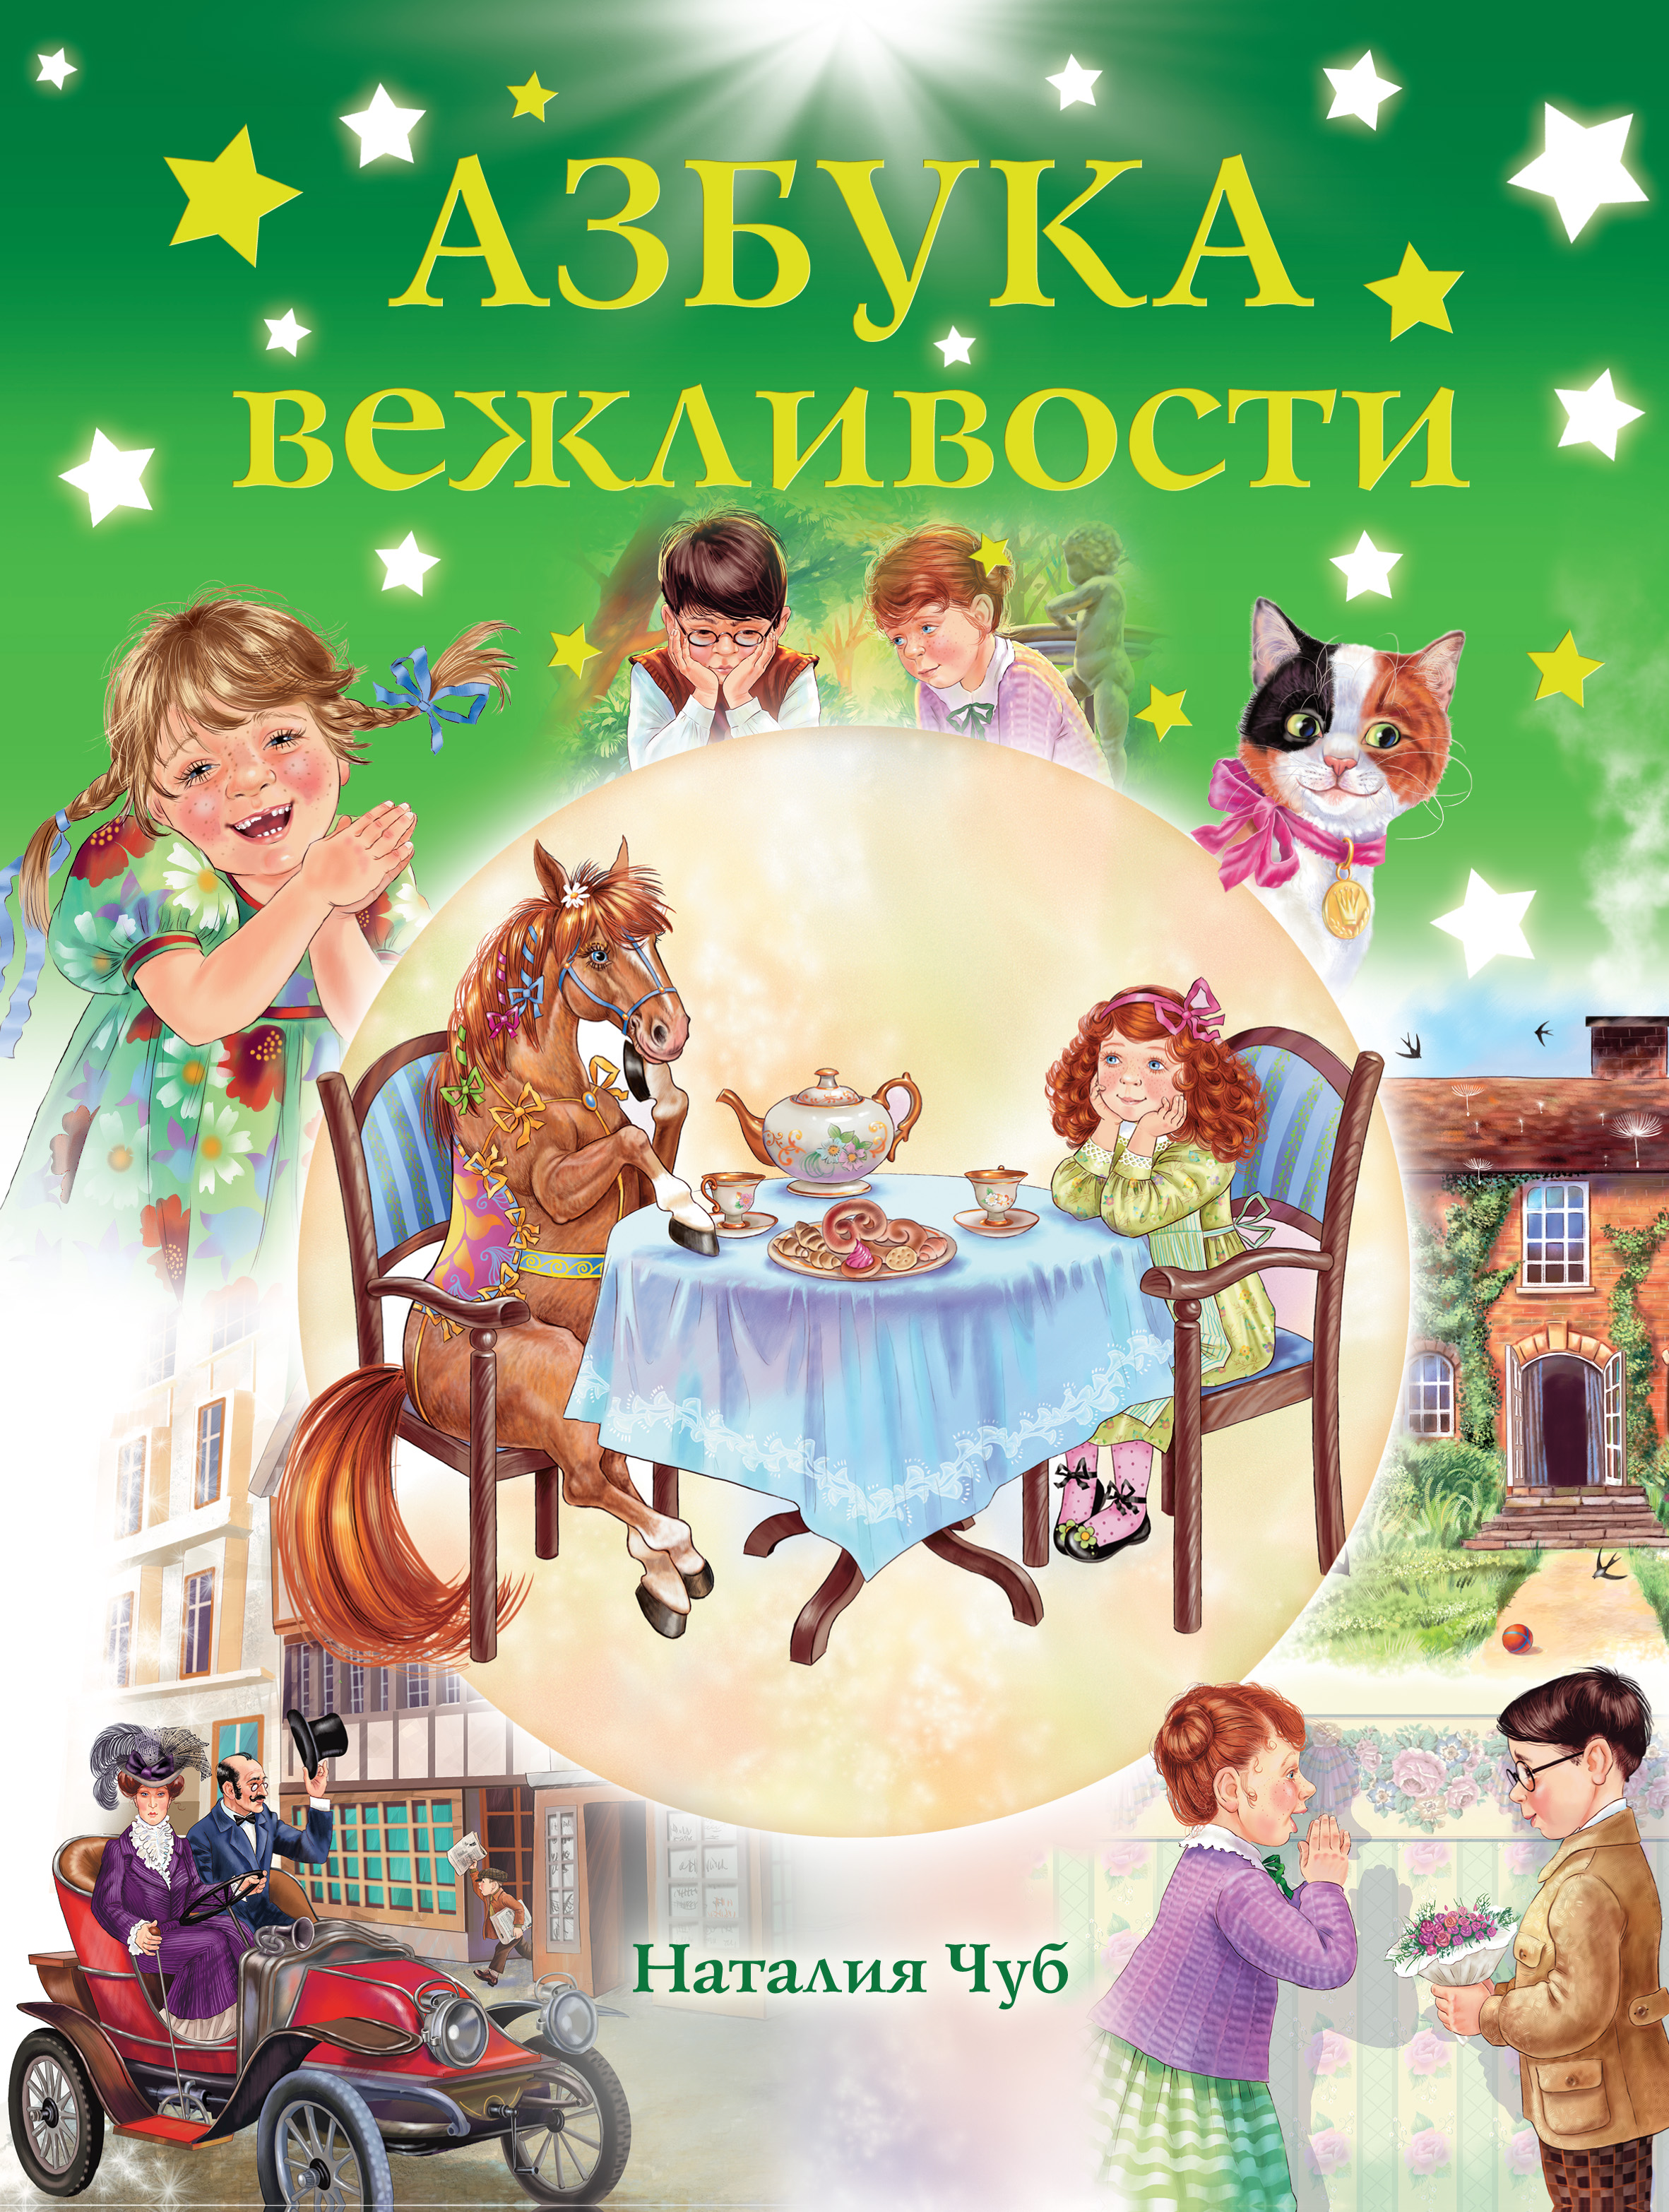 Наталия Чуб Азбука вежливости васильева гангнус л азбука вежливости